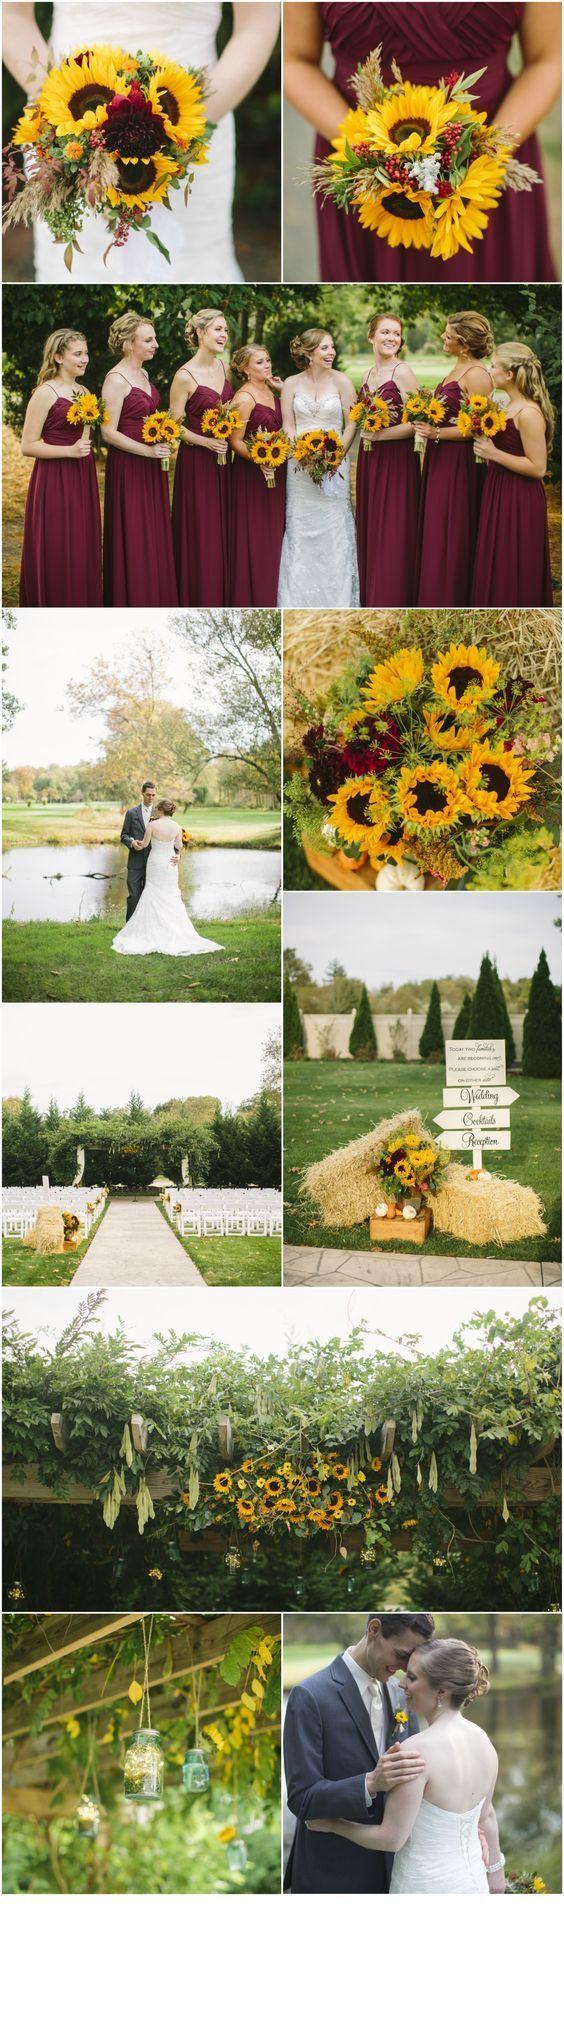 sunflower wedding theme ideas / http://www.himisspuff.com/country-sunflower-wedding-ideas/